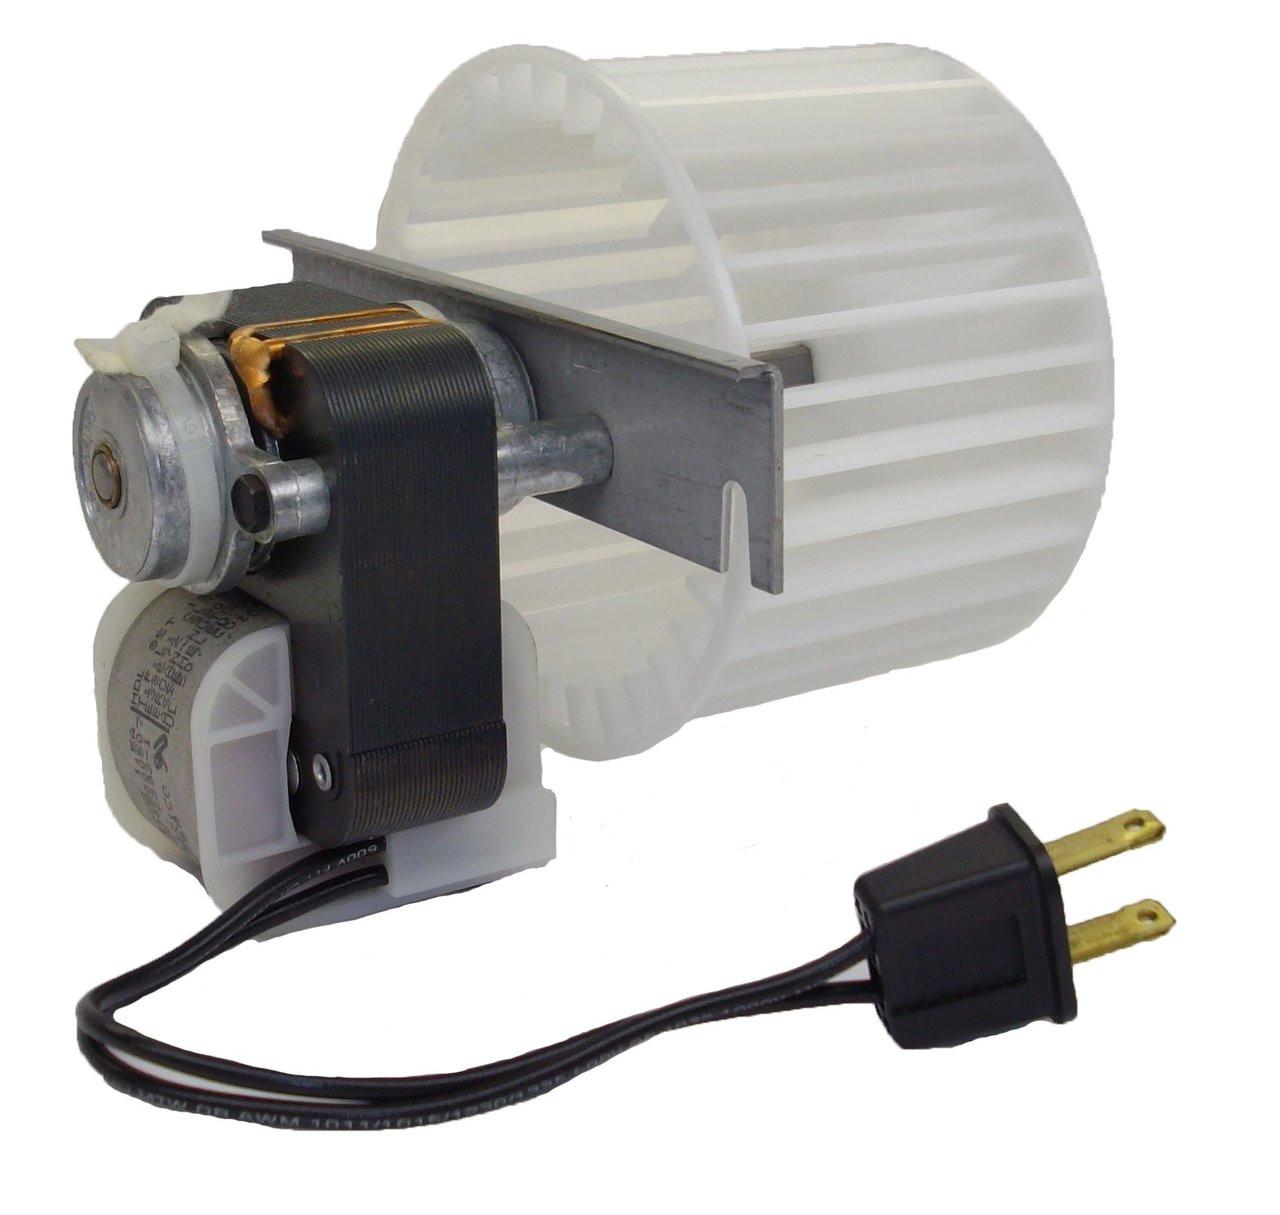 Broan 162 a 162 b vent fan motor 2650 rpm 1 5 amp 120v 97005906